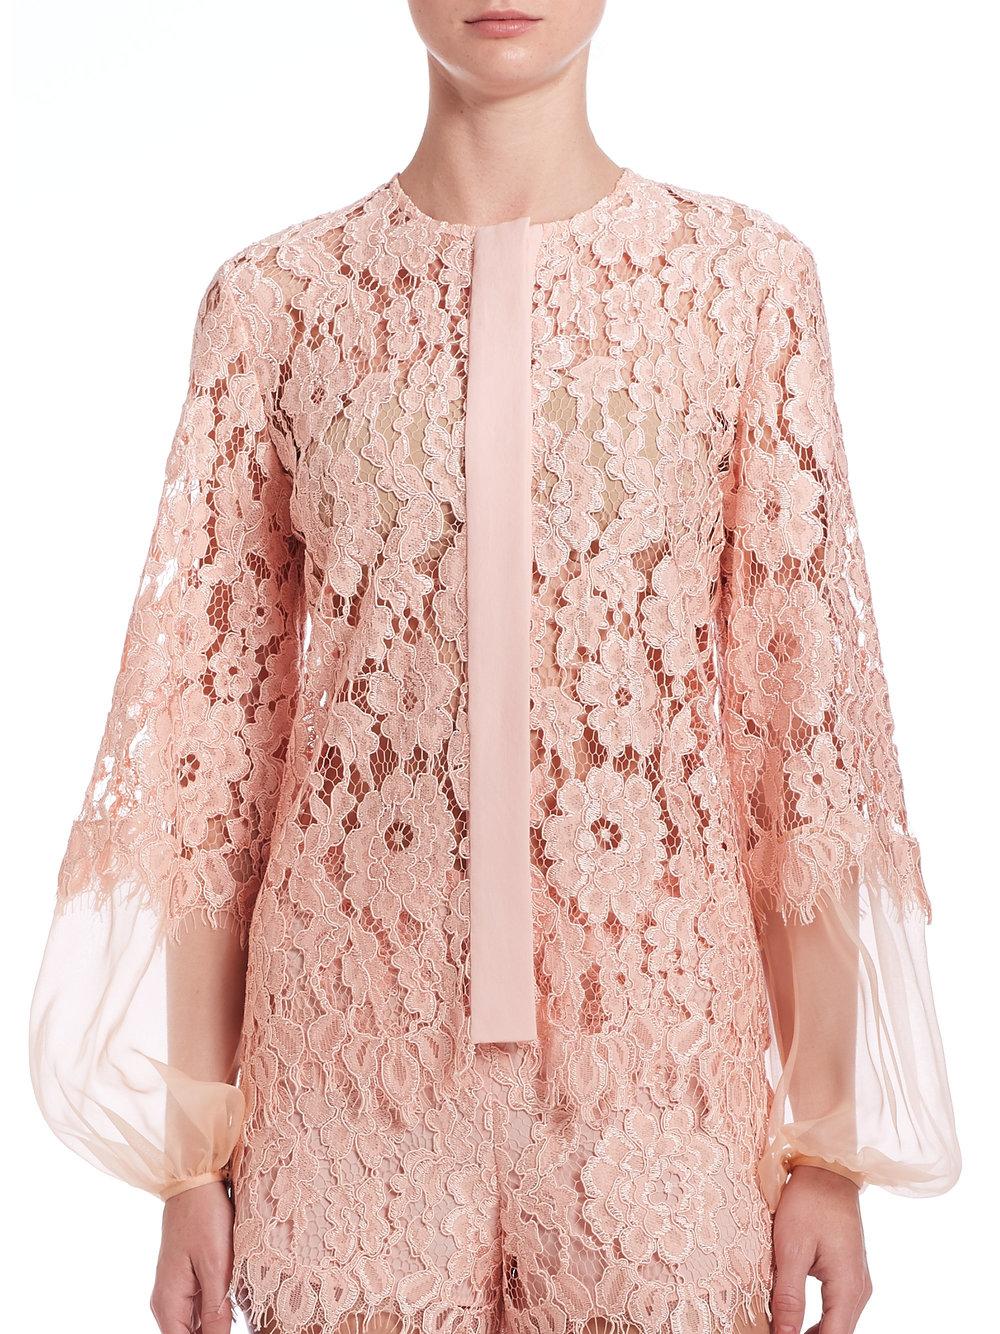 blouse kain brukat.jpeg